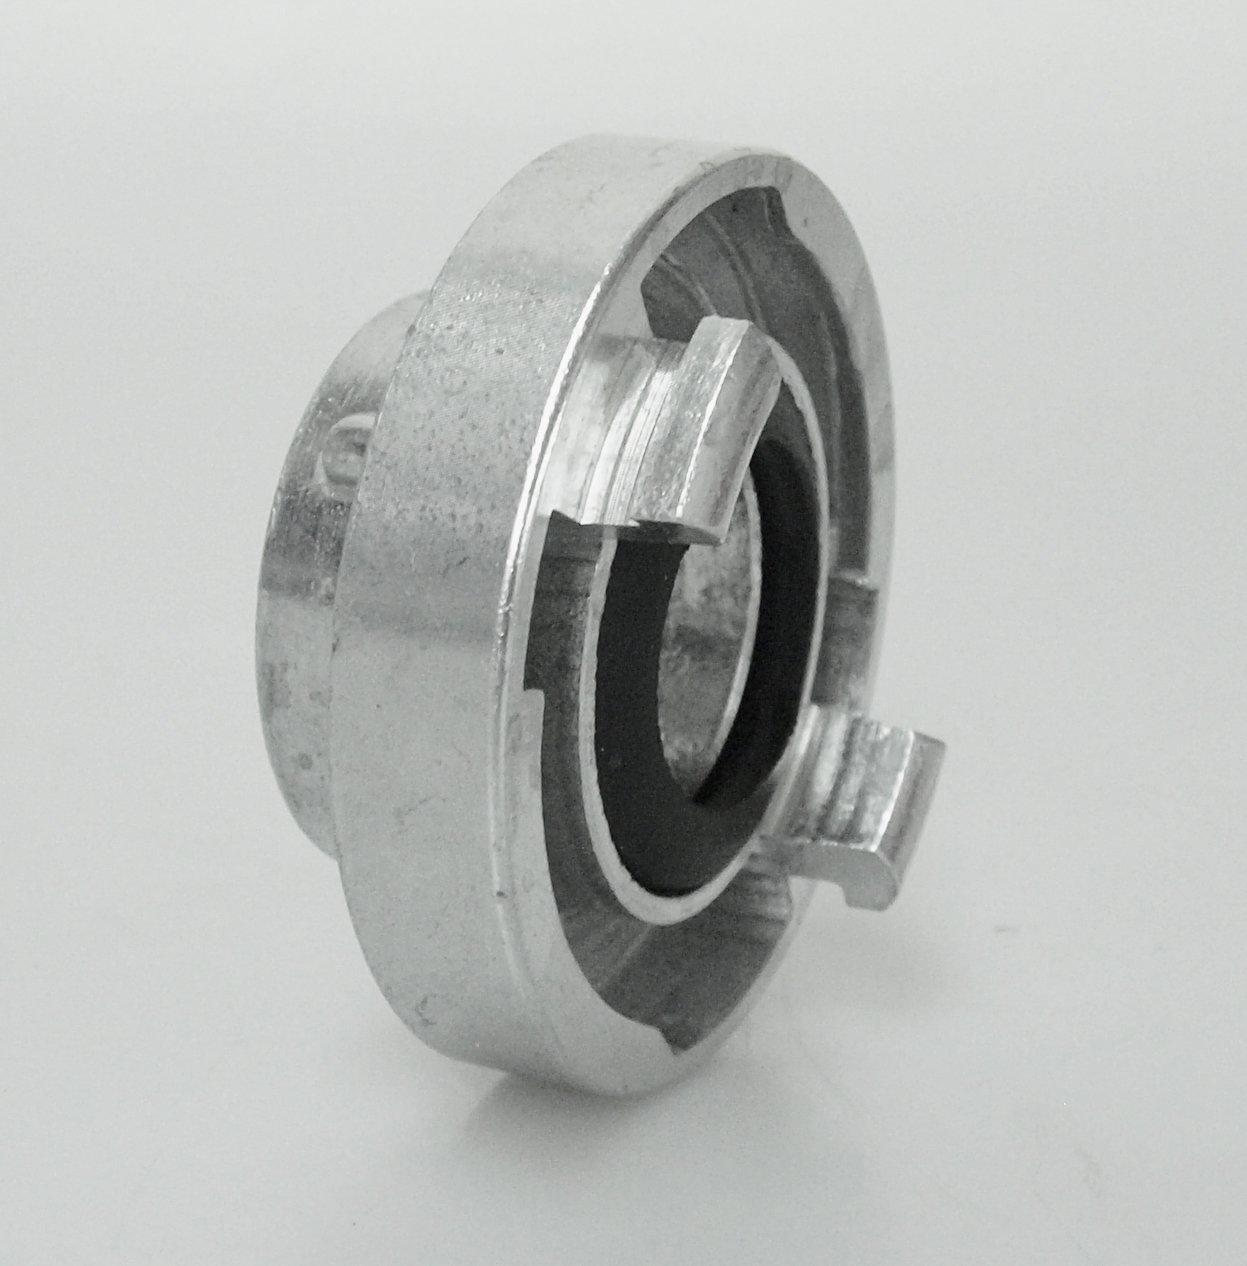 Plata 45,48 mm TIP Acoplamiento C-Storz de 1,5 Pulgadas IG